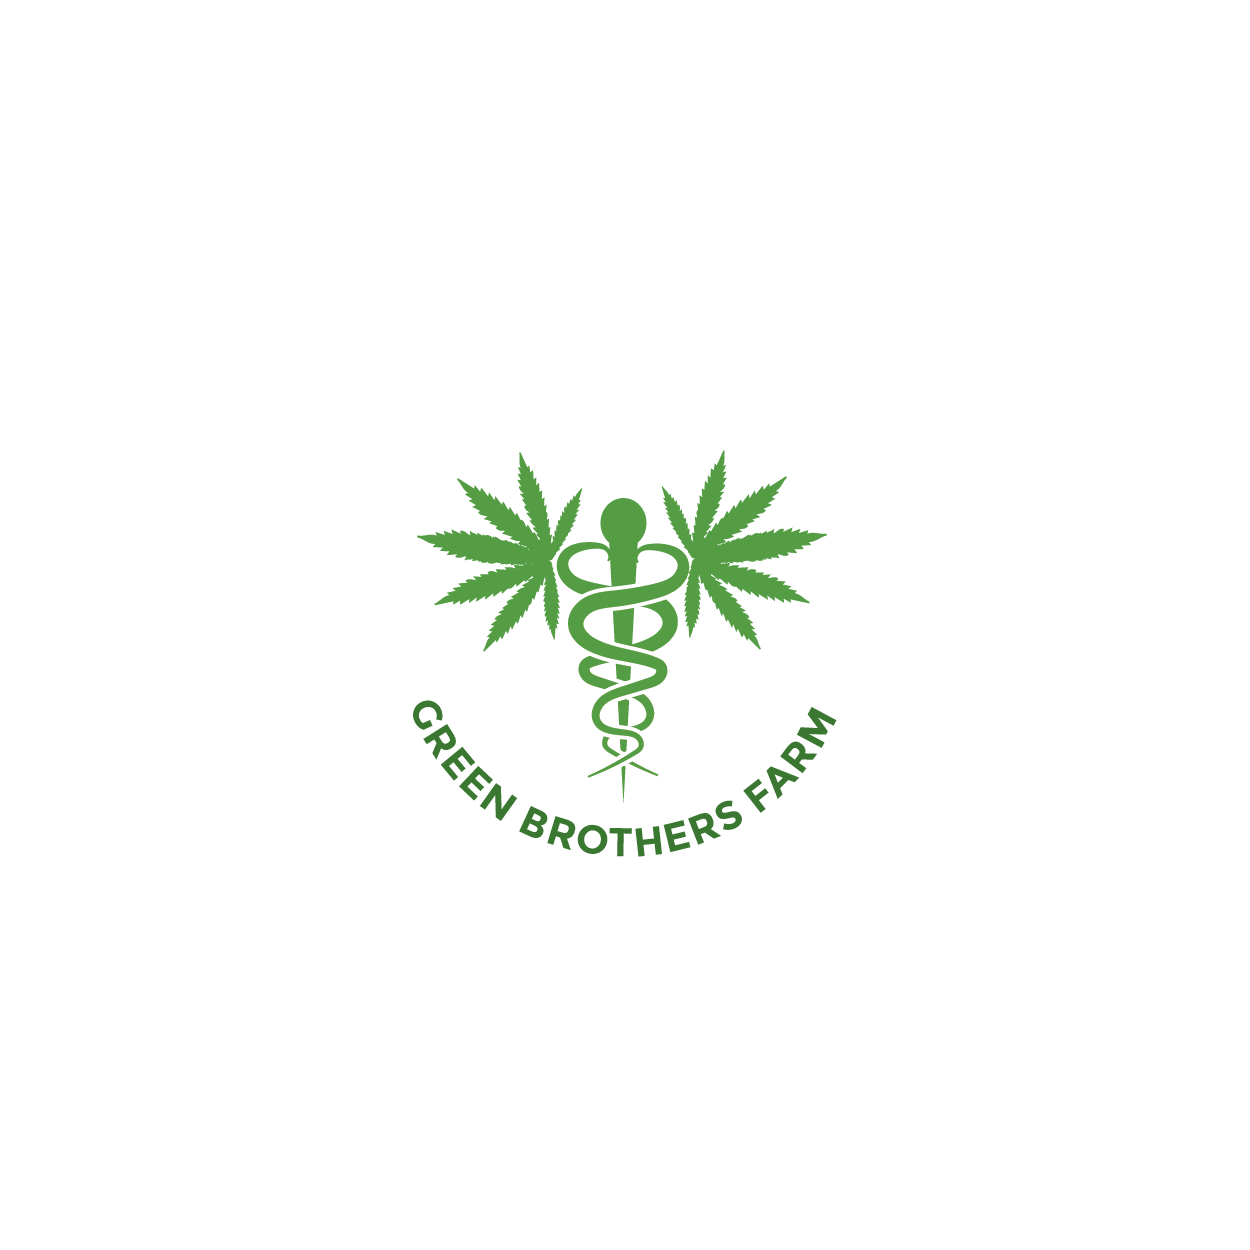 Logo Design by 354studio - Entry No. 62 in the Logo Design Contest Green Brothers Farm Logo Design.